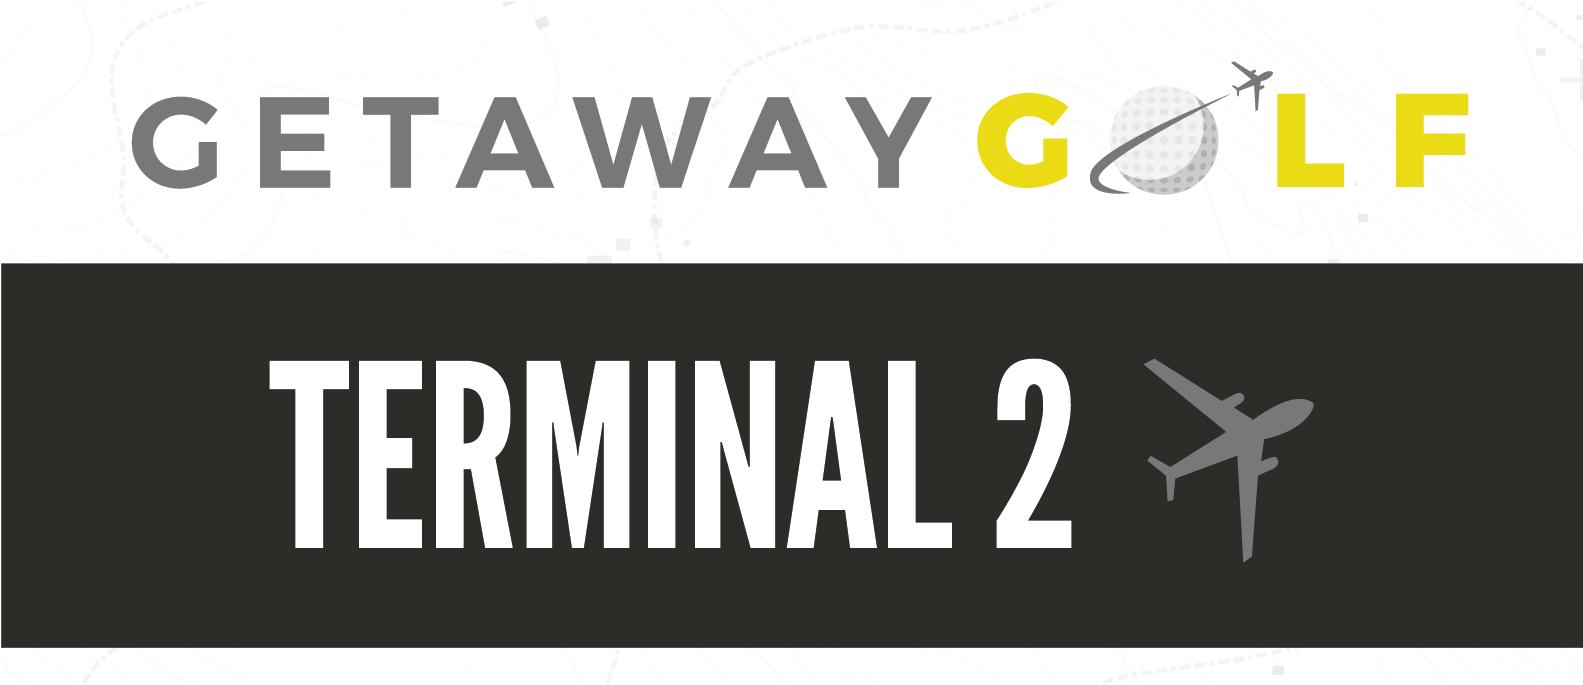 Getaway-Golf-Signage-4-1-17-FINALS-17.jpg